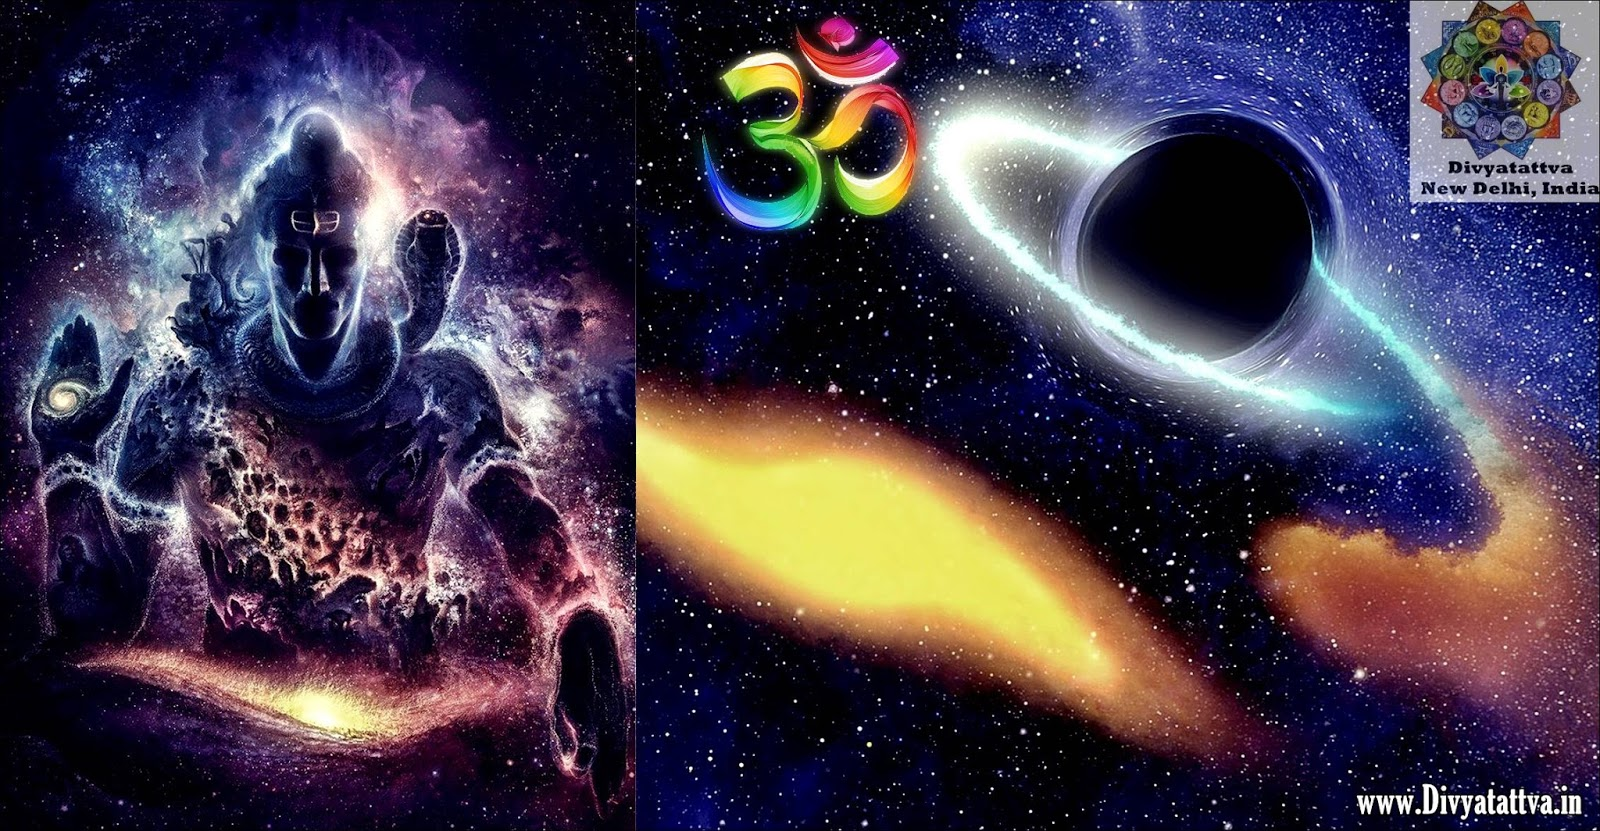 lord shiva wallpaper shiv parvati goddess hindu yoga aghori cosmos galaxy rohit anand divyatattva.in